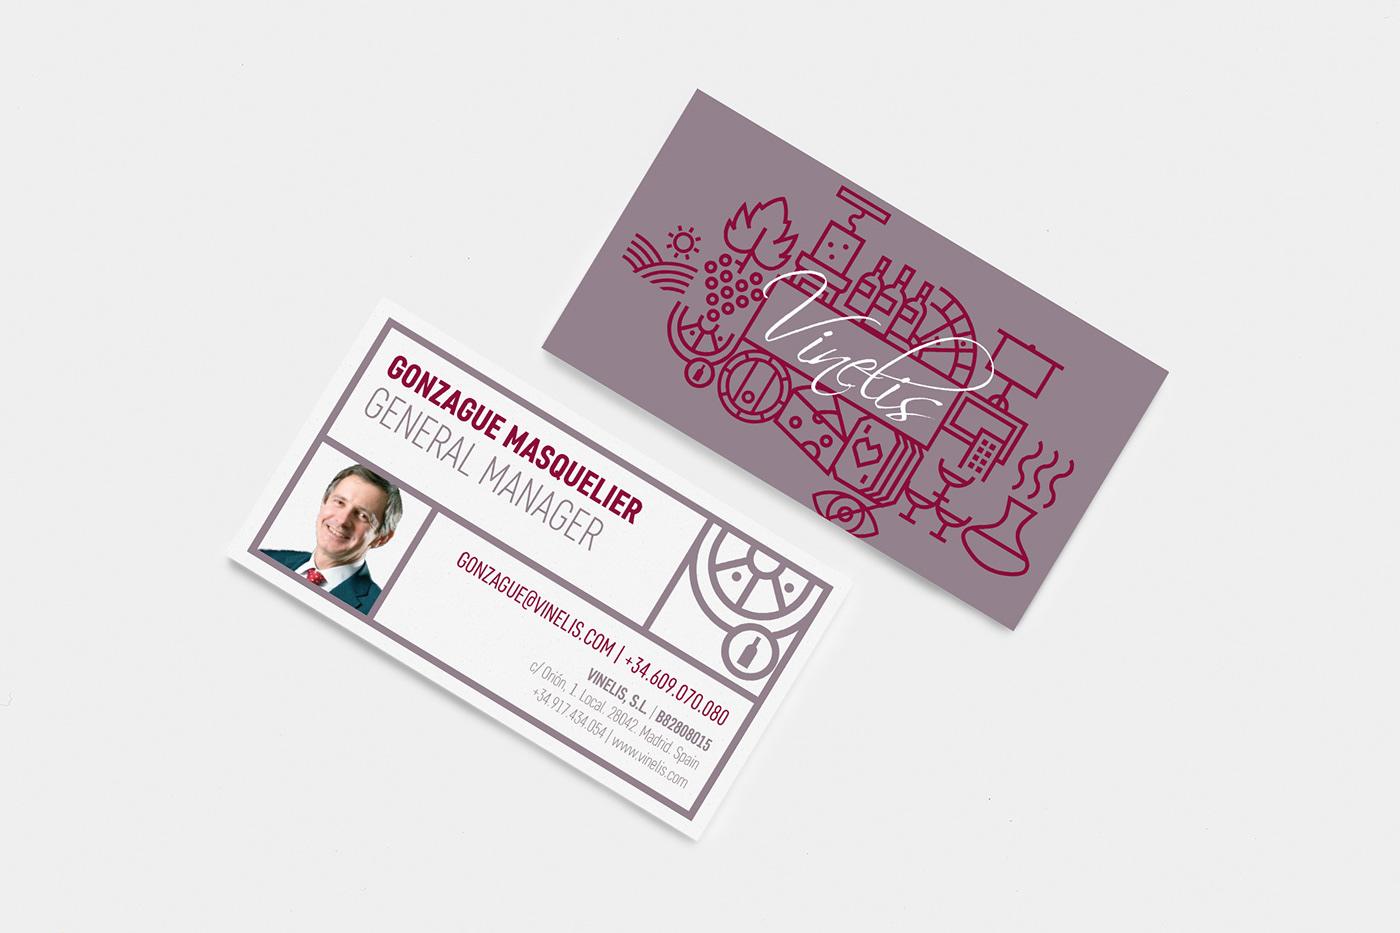 branding  identidad identity marca redesign rediseño